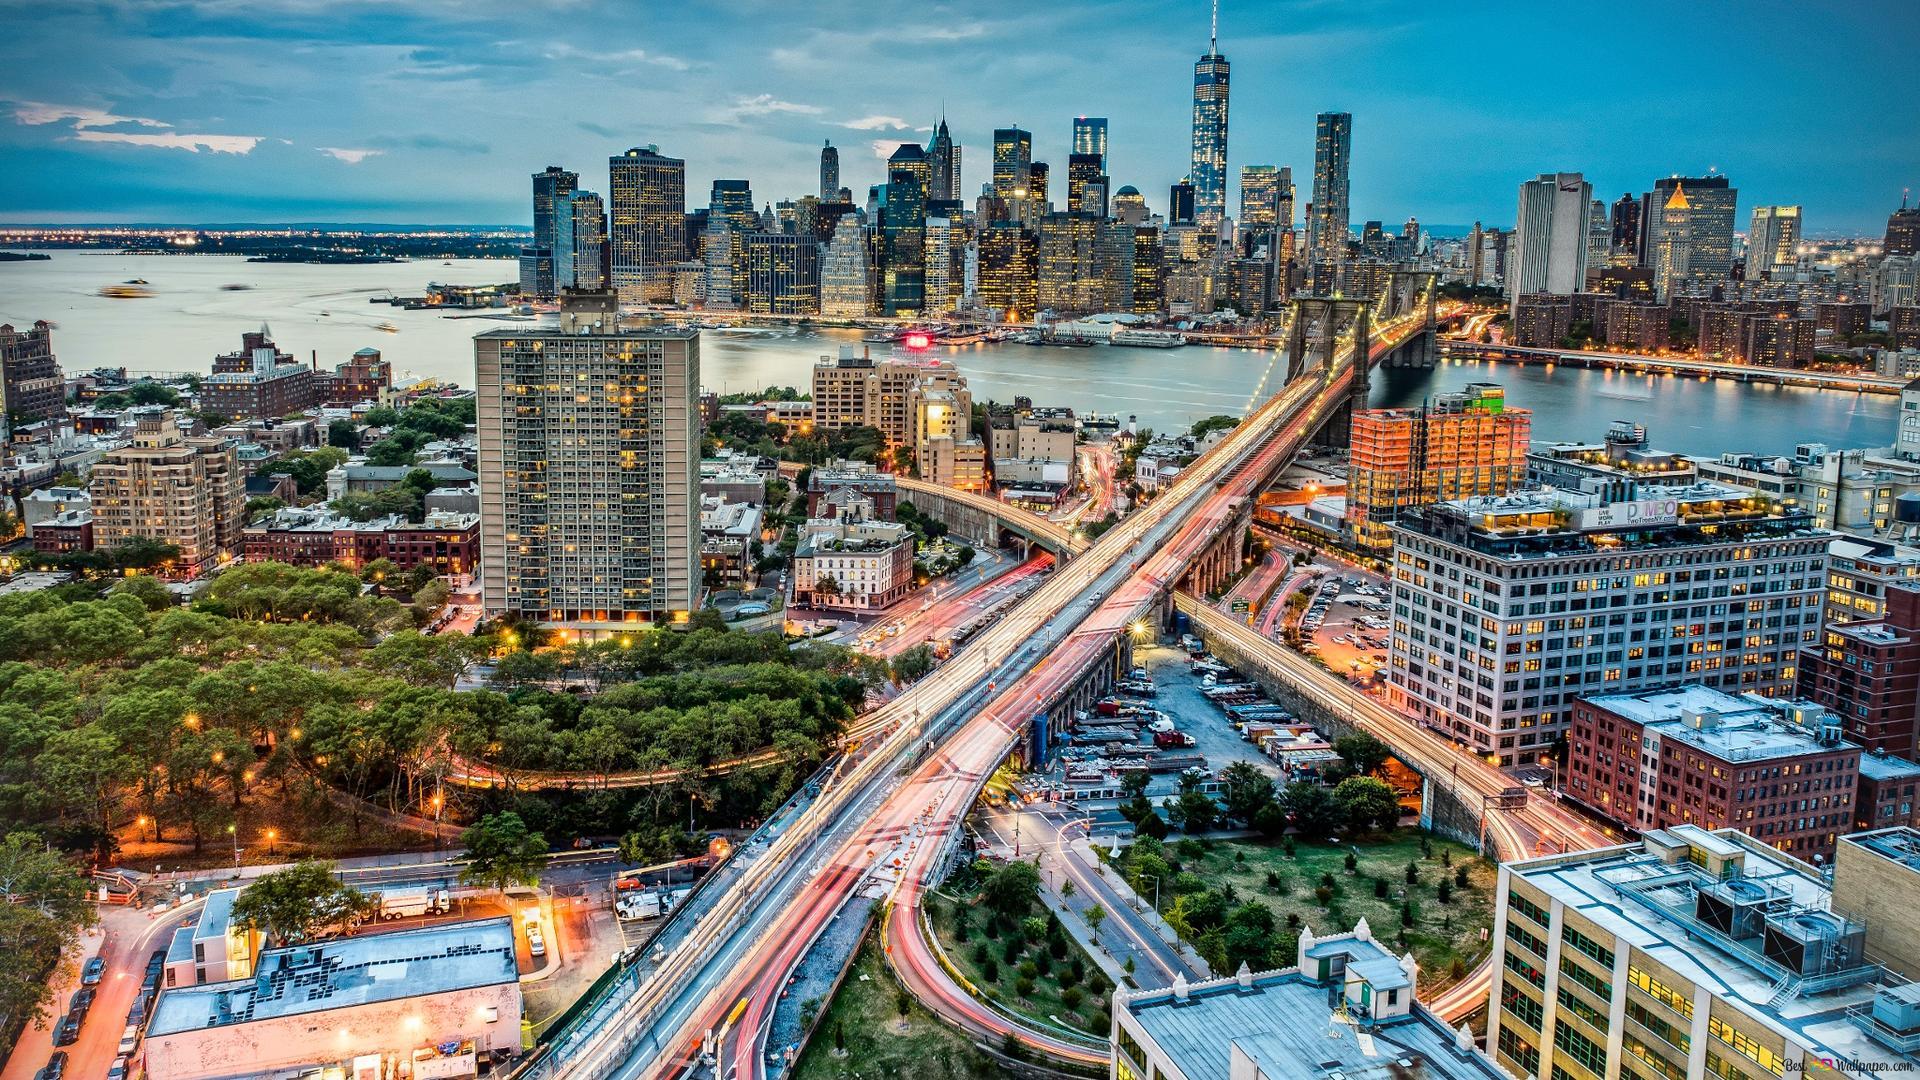 New York City Flyover Hd Hintergrundbilder Herunterladen